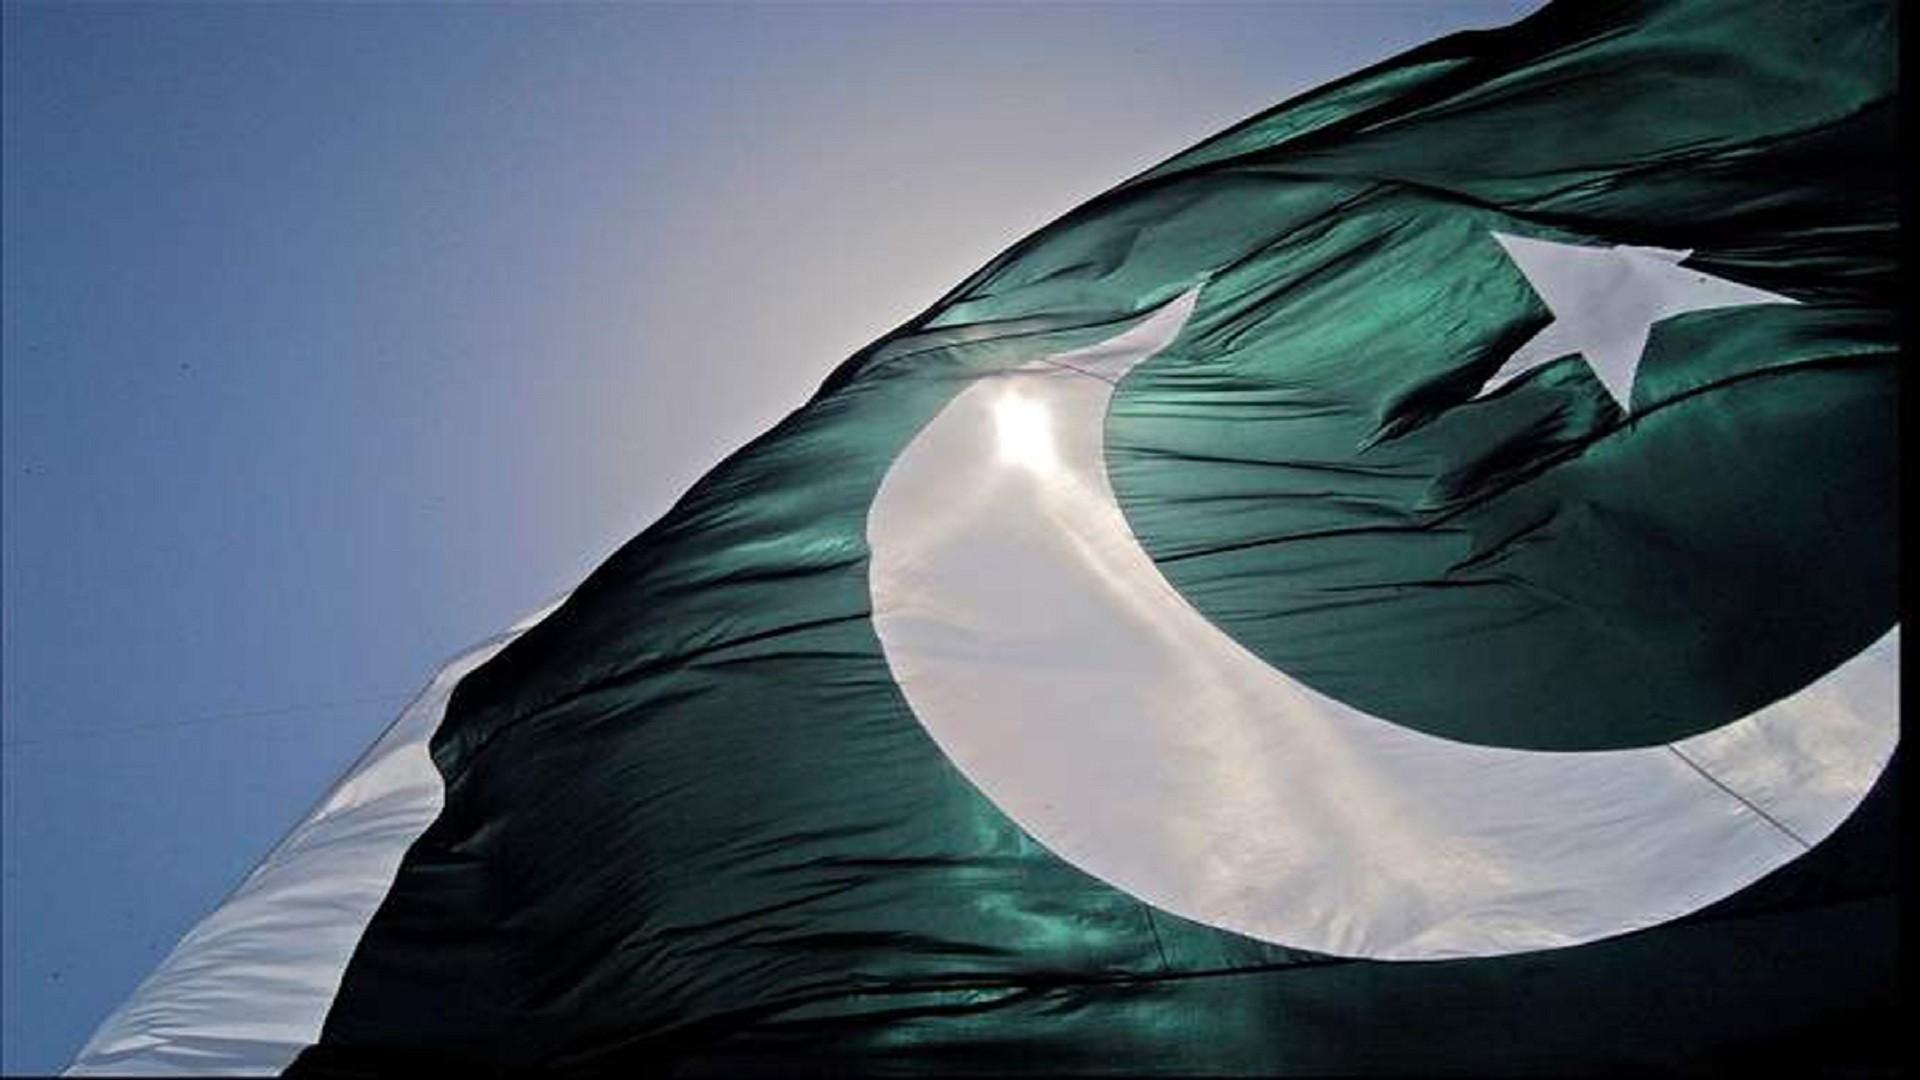 Download – Pakistan Flag HD Image …